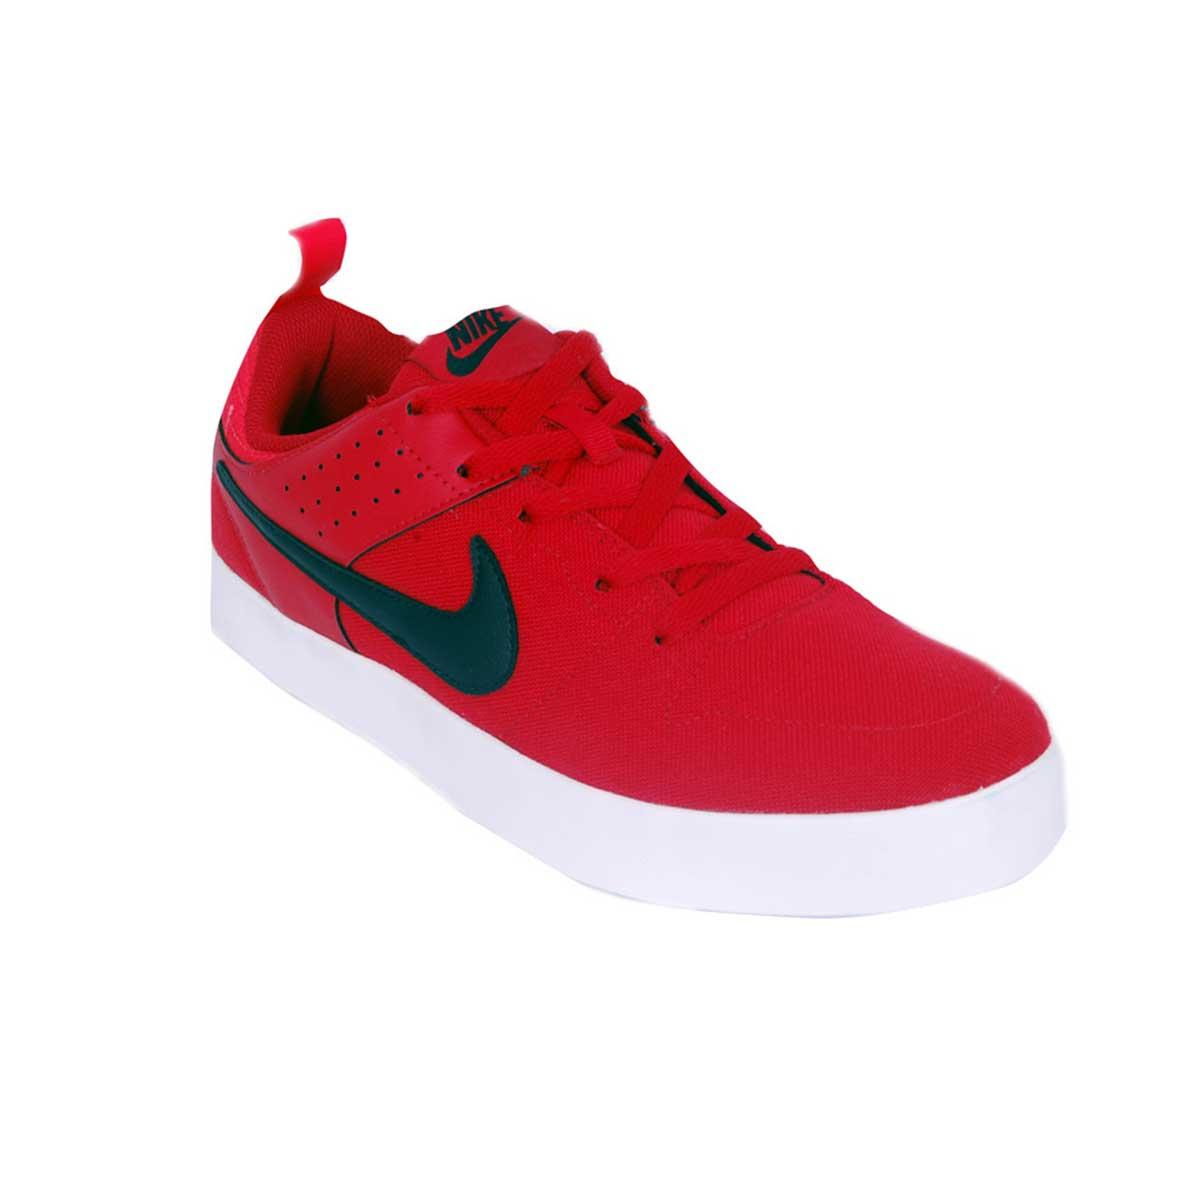 Running Shoes, Running, Buy, Nike, Nike Liteforce III Shoes (Red/Grey/White)